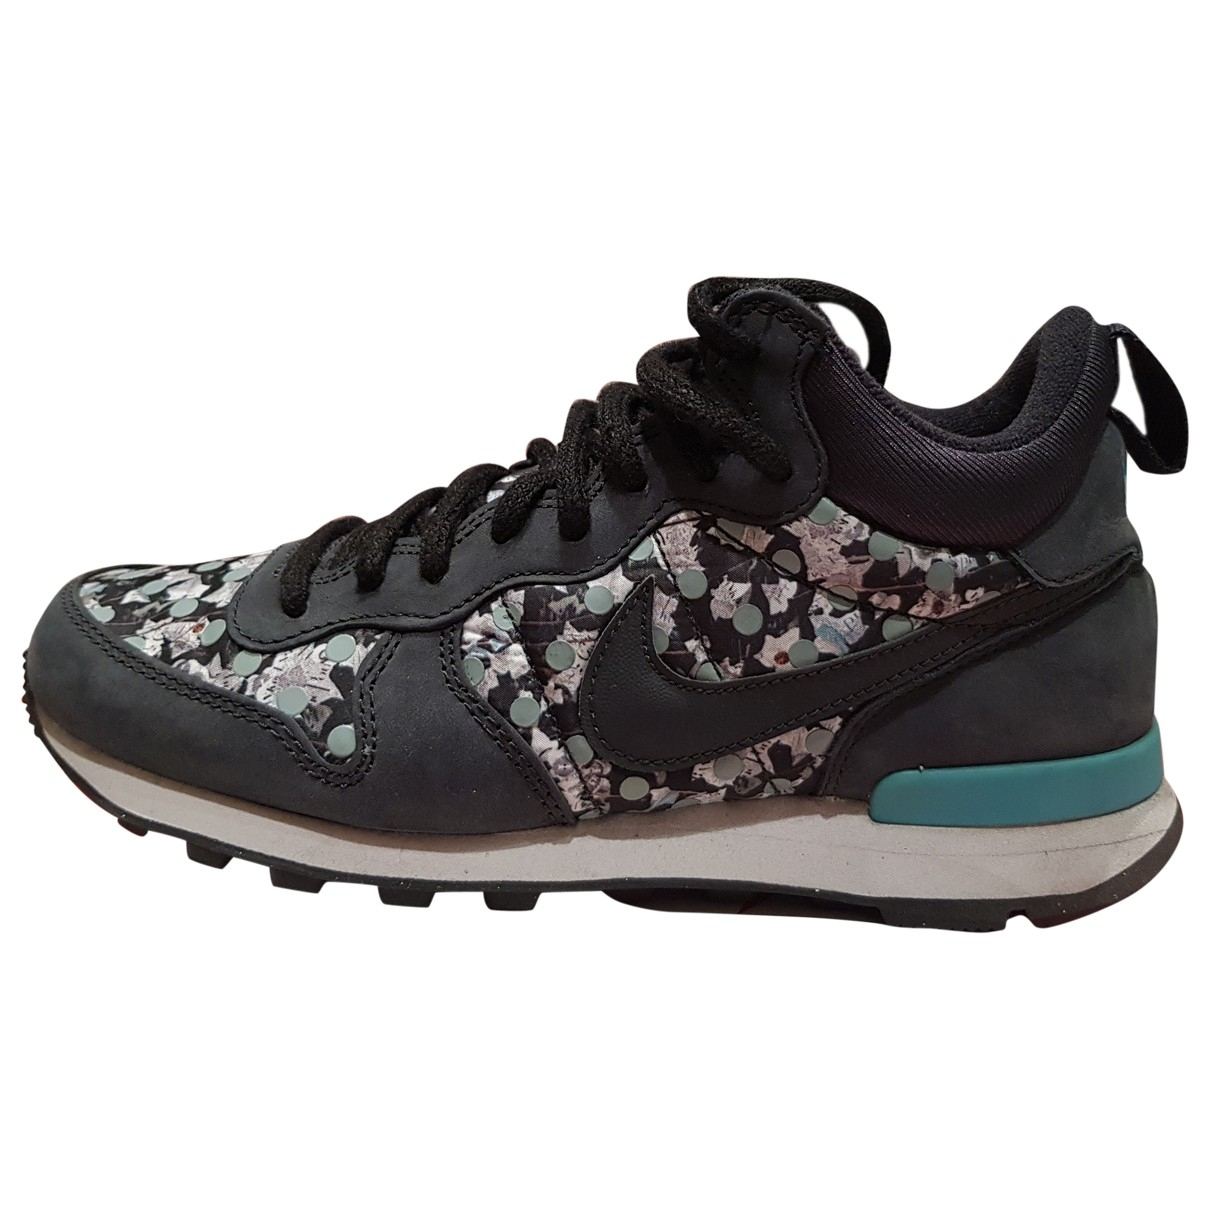 Nike Internationalist Multicolour Leather Trainers for Women 4 UK